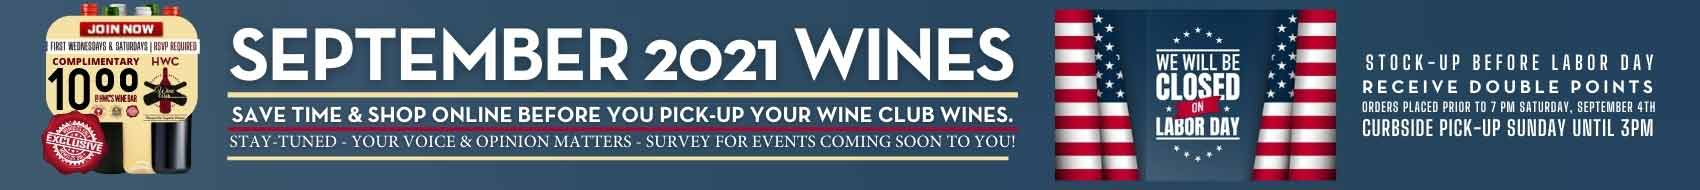 sept-wine-club-banner.jpg